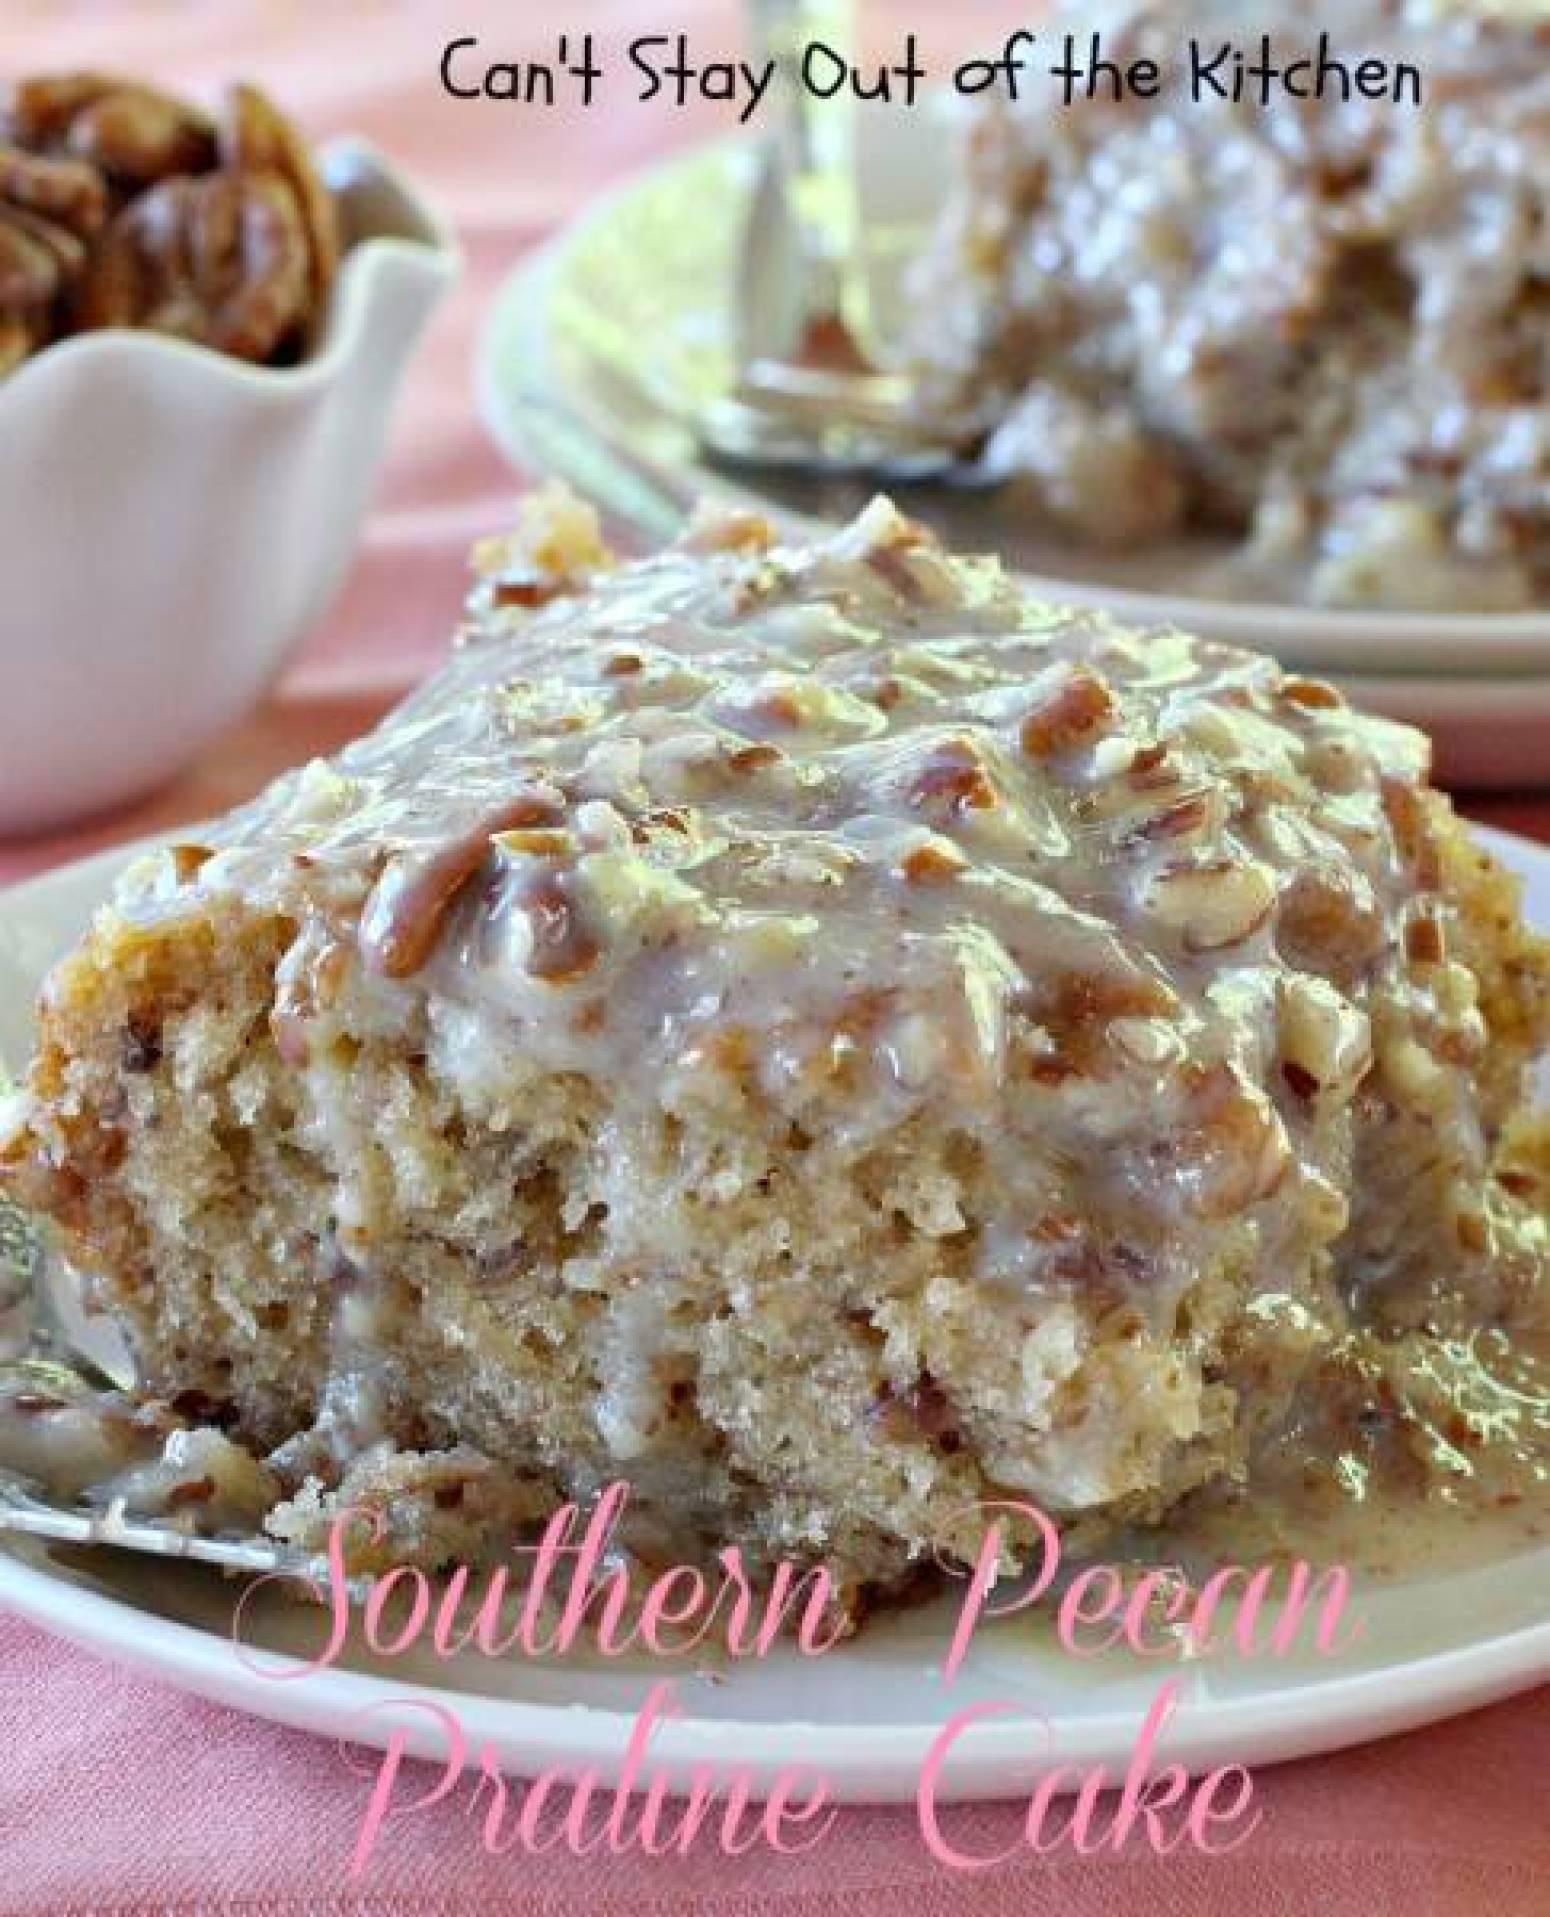 Southern Pecan Praline Cake Recipe 3 | Just A Pinch Recipes